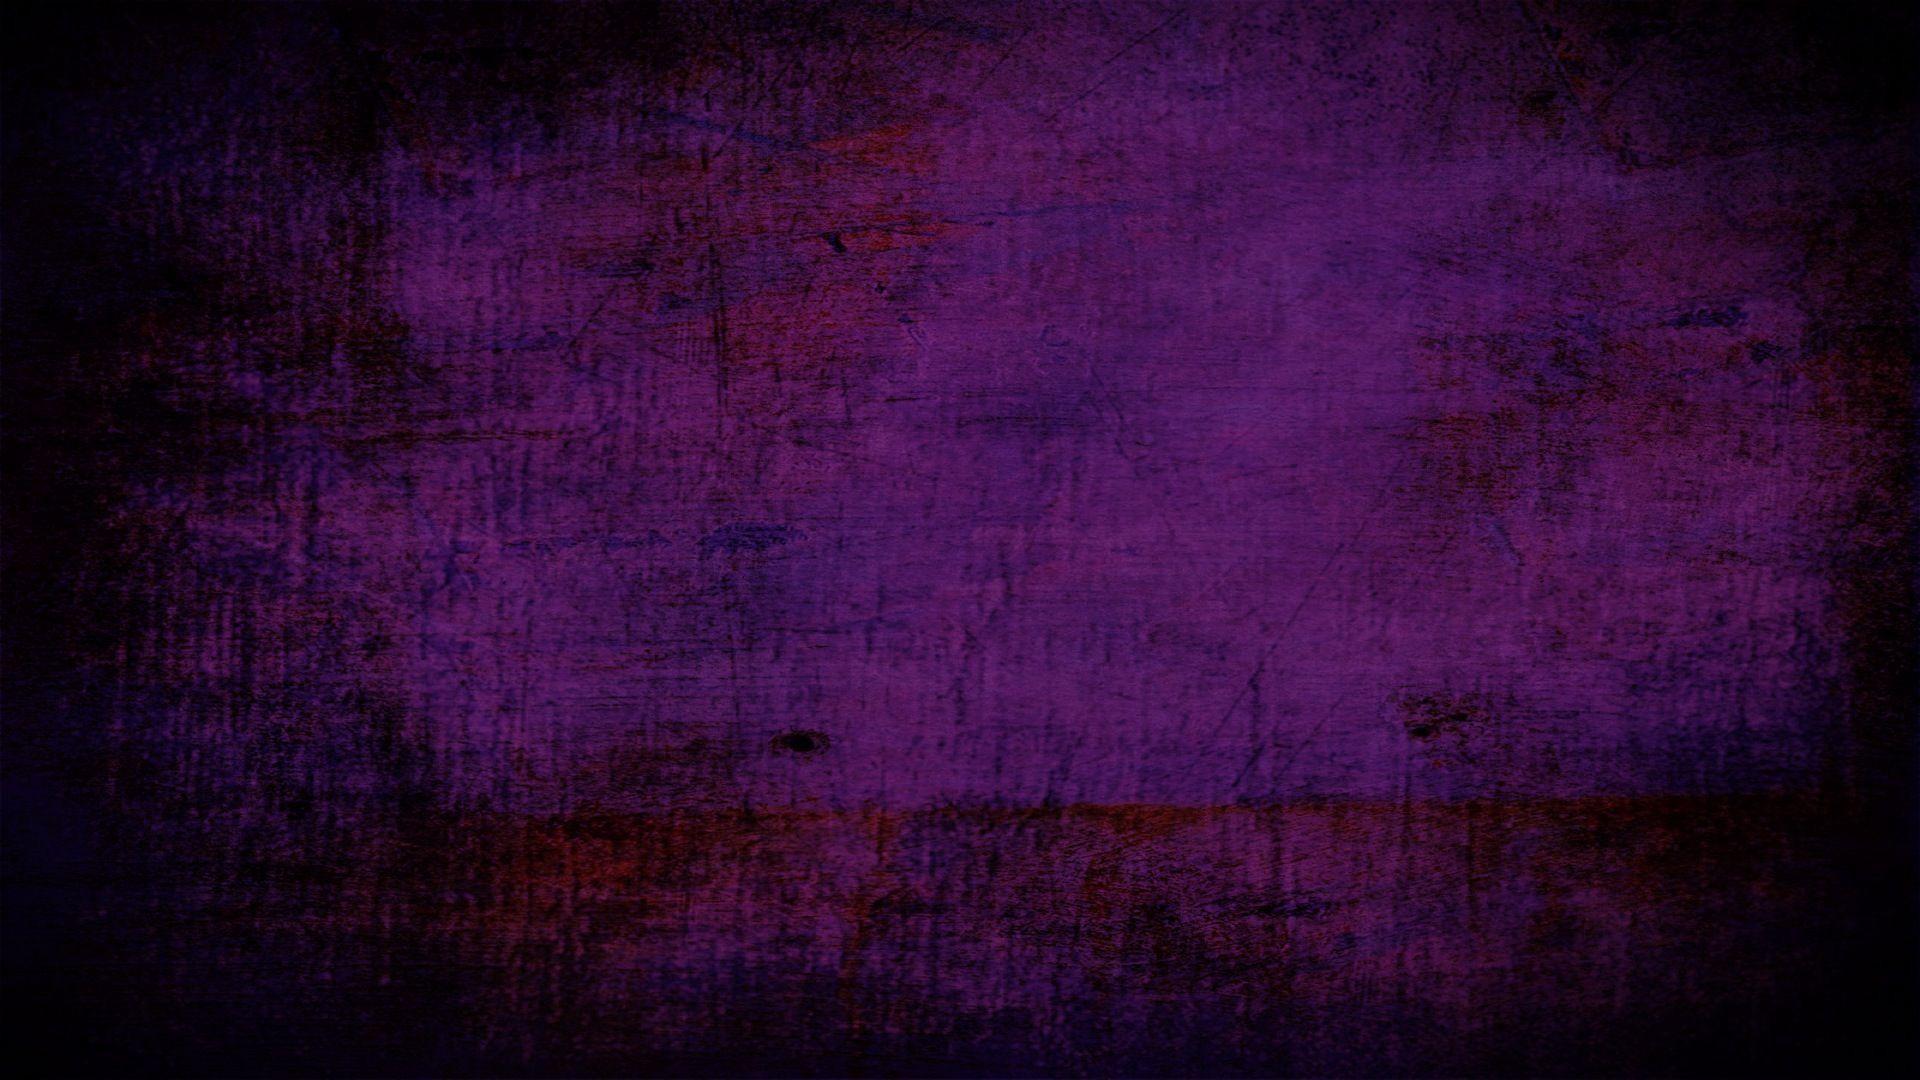 dark purple background Wallpaper HD Image 2971